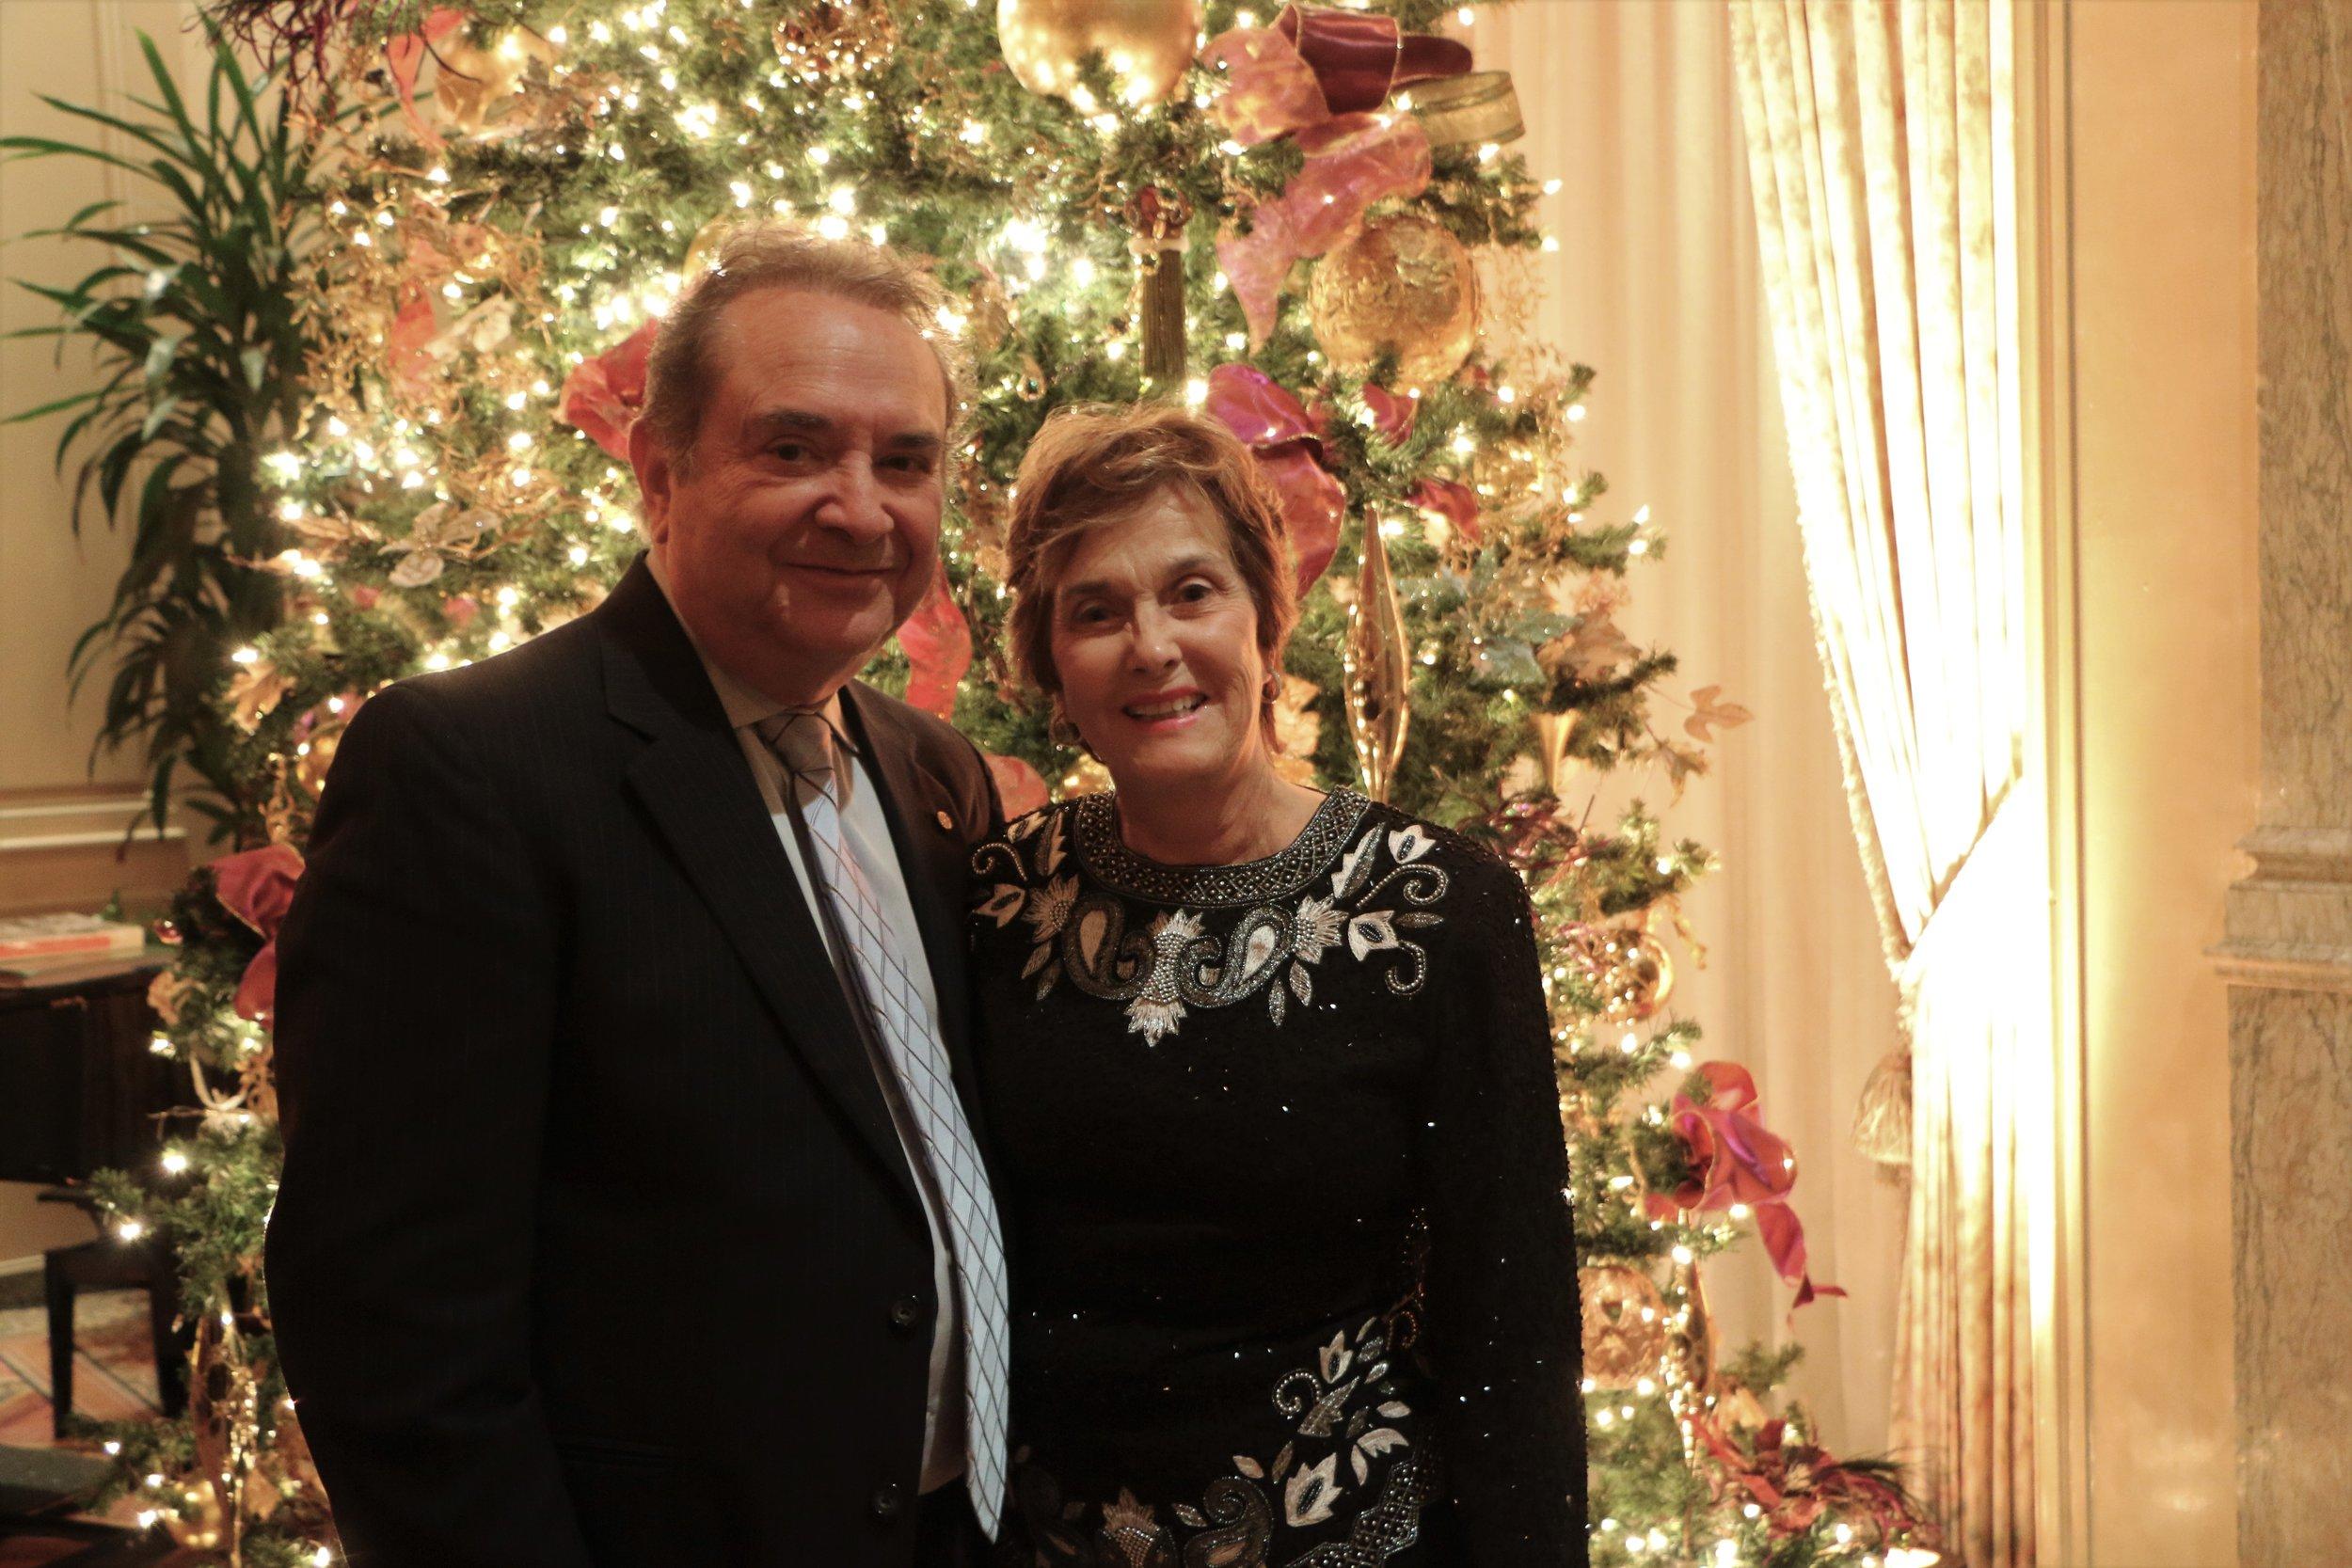 Robert and Josephine Barbera